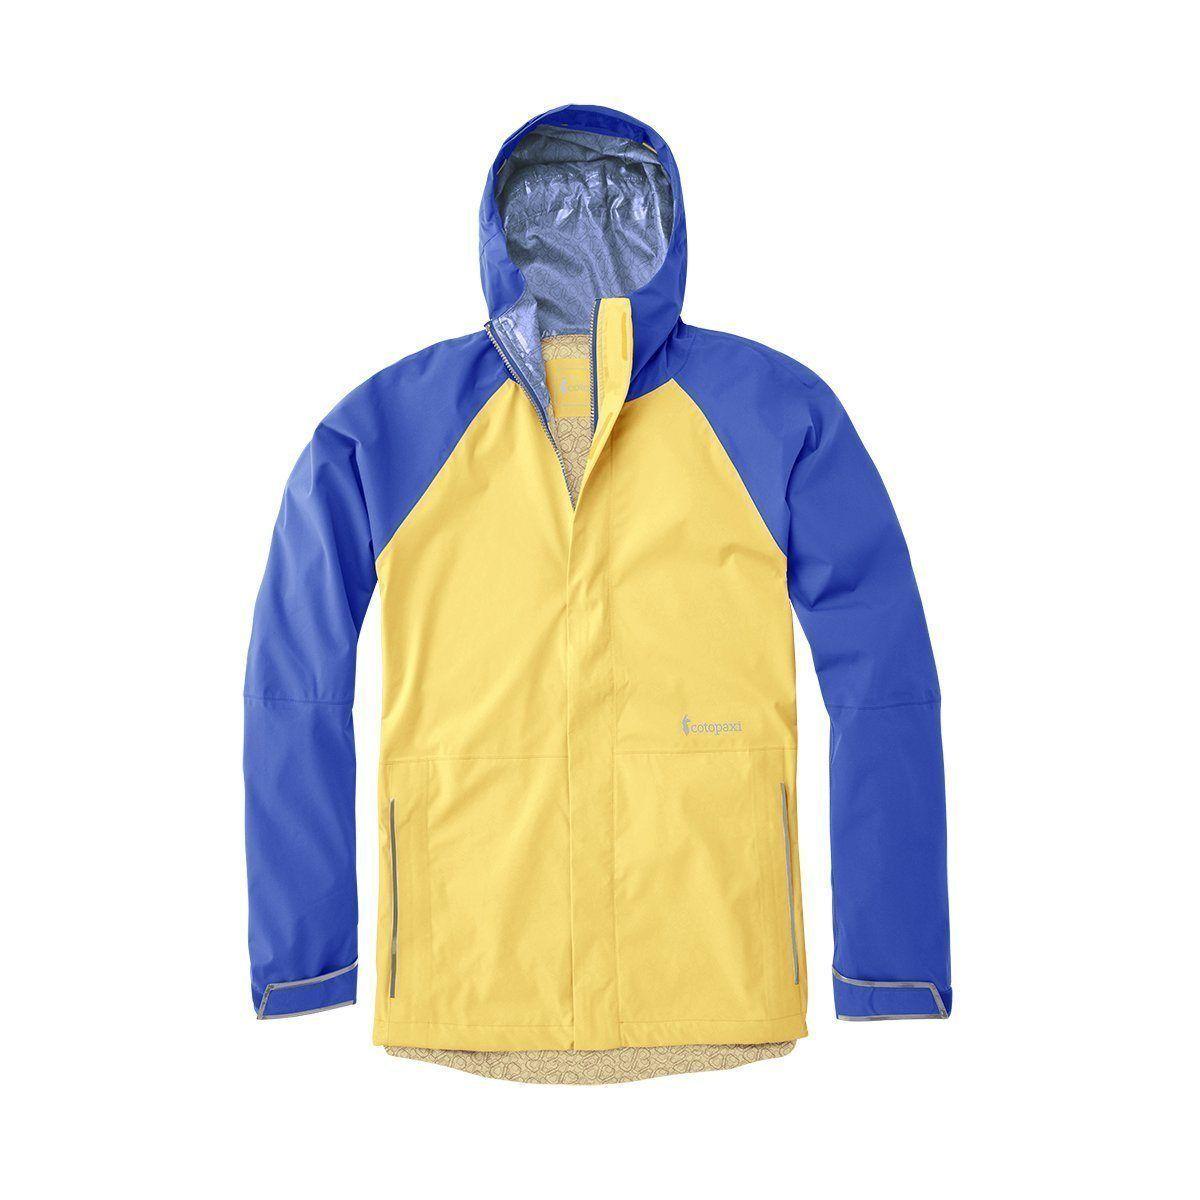 Tikal Active Shell Men S Sale Mens Jackets Athletic Jacket Mens Outfits [ 1200 x 1200 Pixel ]